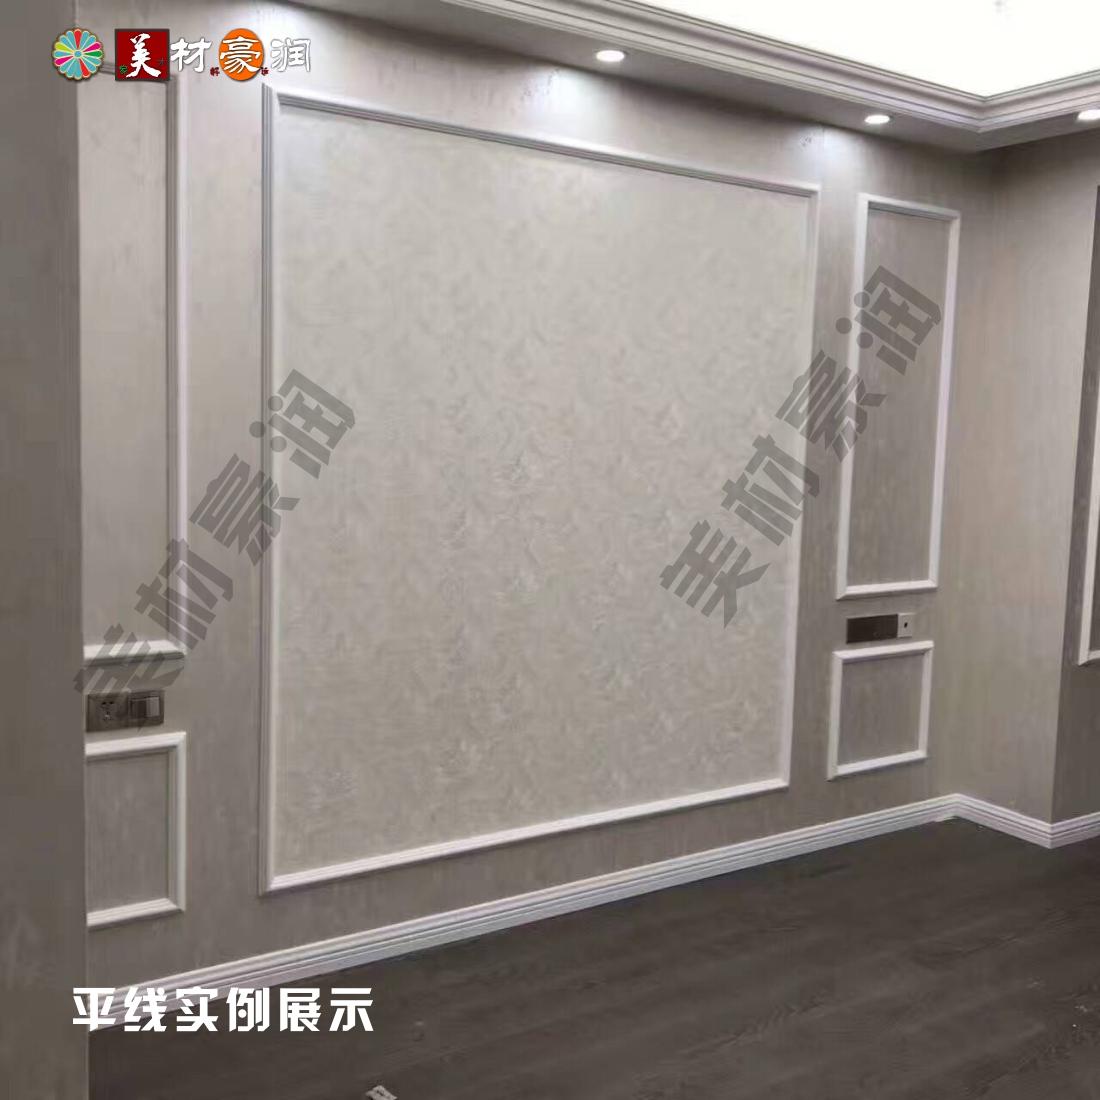 pu欧式造型电视背景墙装饰条天花吊顶石膏pu线条